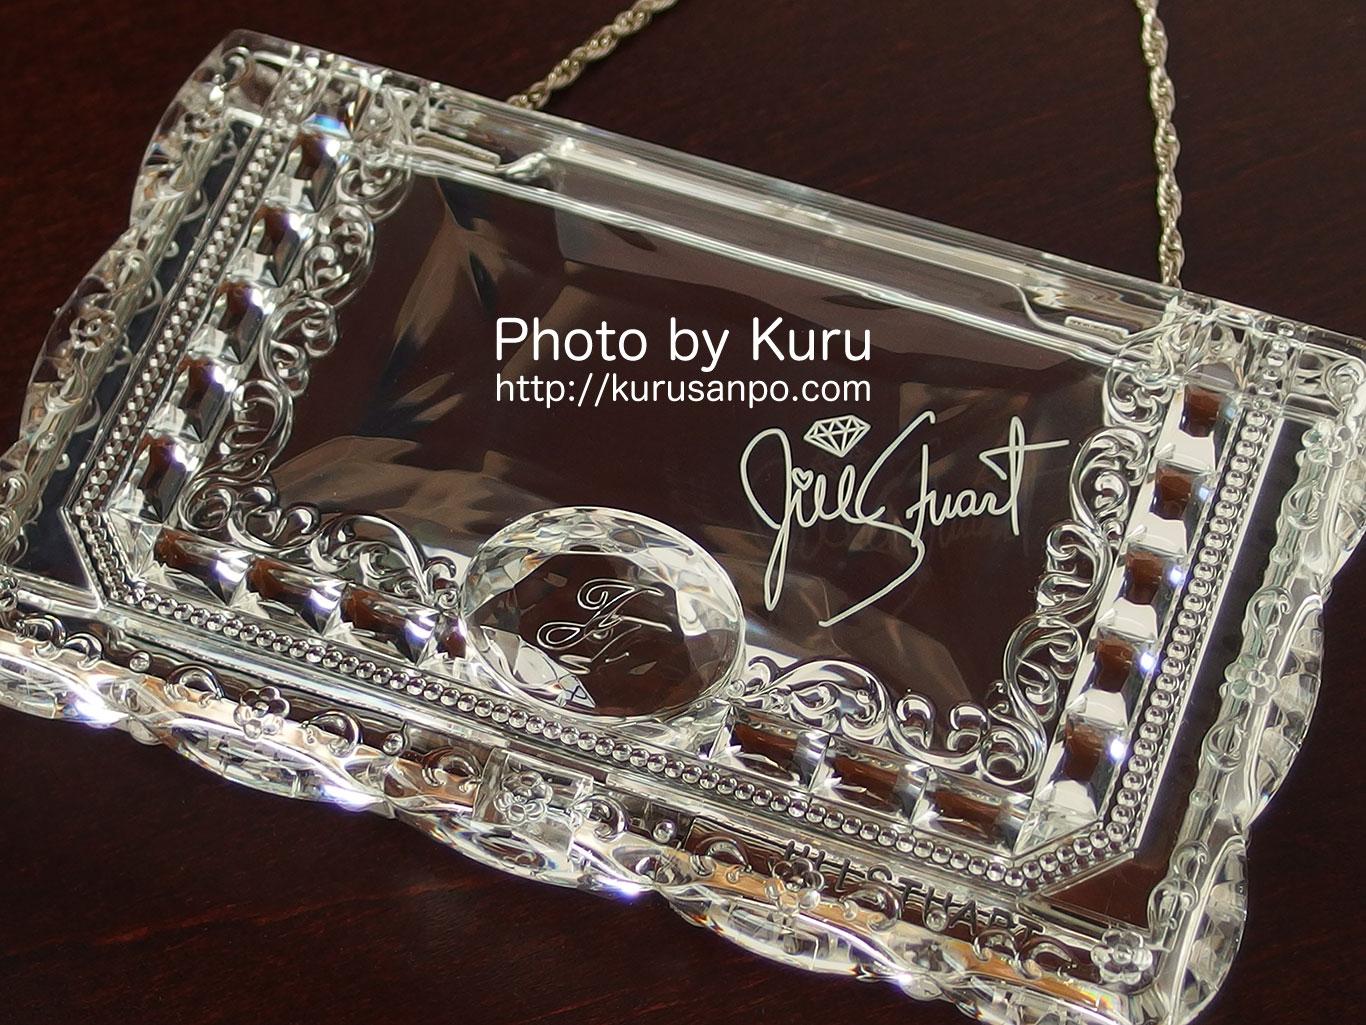 JILL STUART(ジルスチュアート)『エヴァーラスティングシルク パウダーファンデーション フローレスパーフェクション デビューキット』